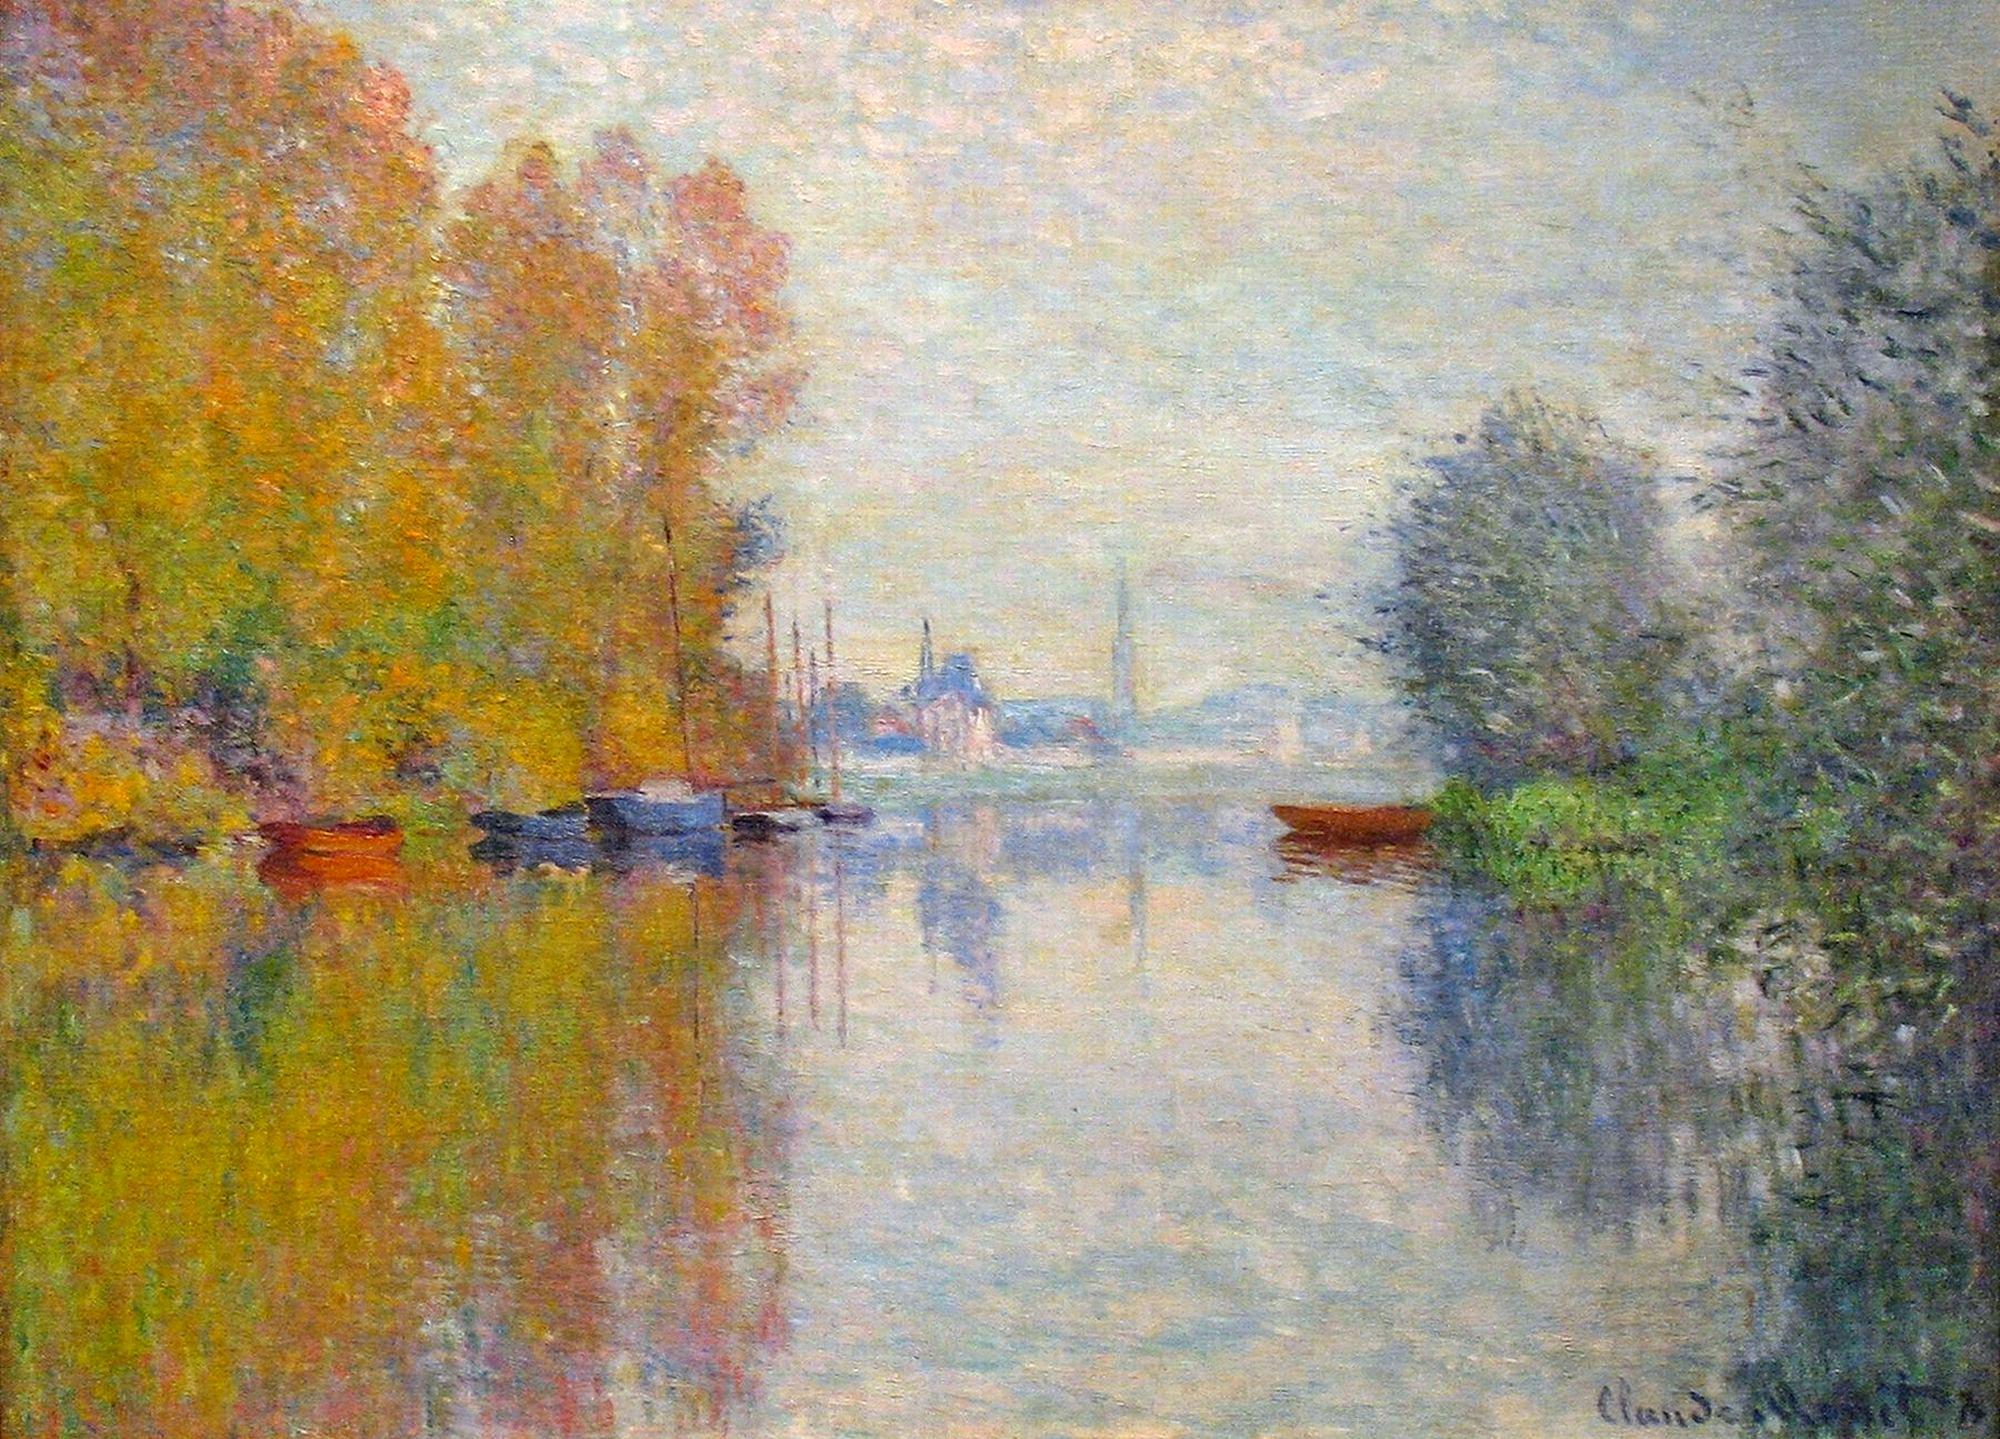 Обои Пейзаж, картина, Жуан-ле-Пен, Клод Моне. Разное foto 10